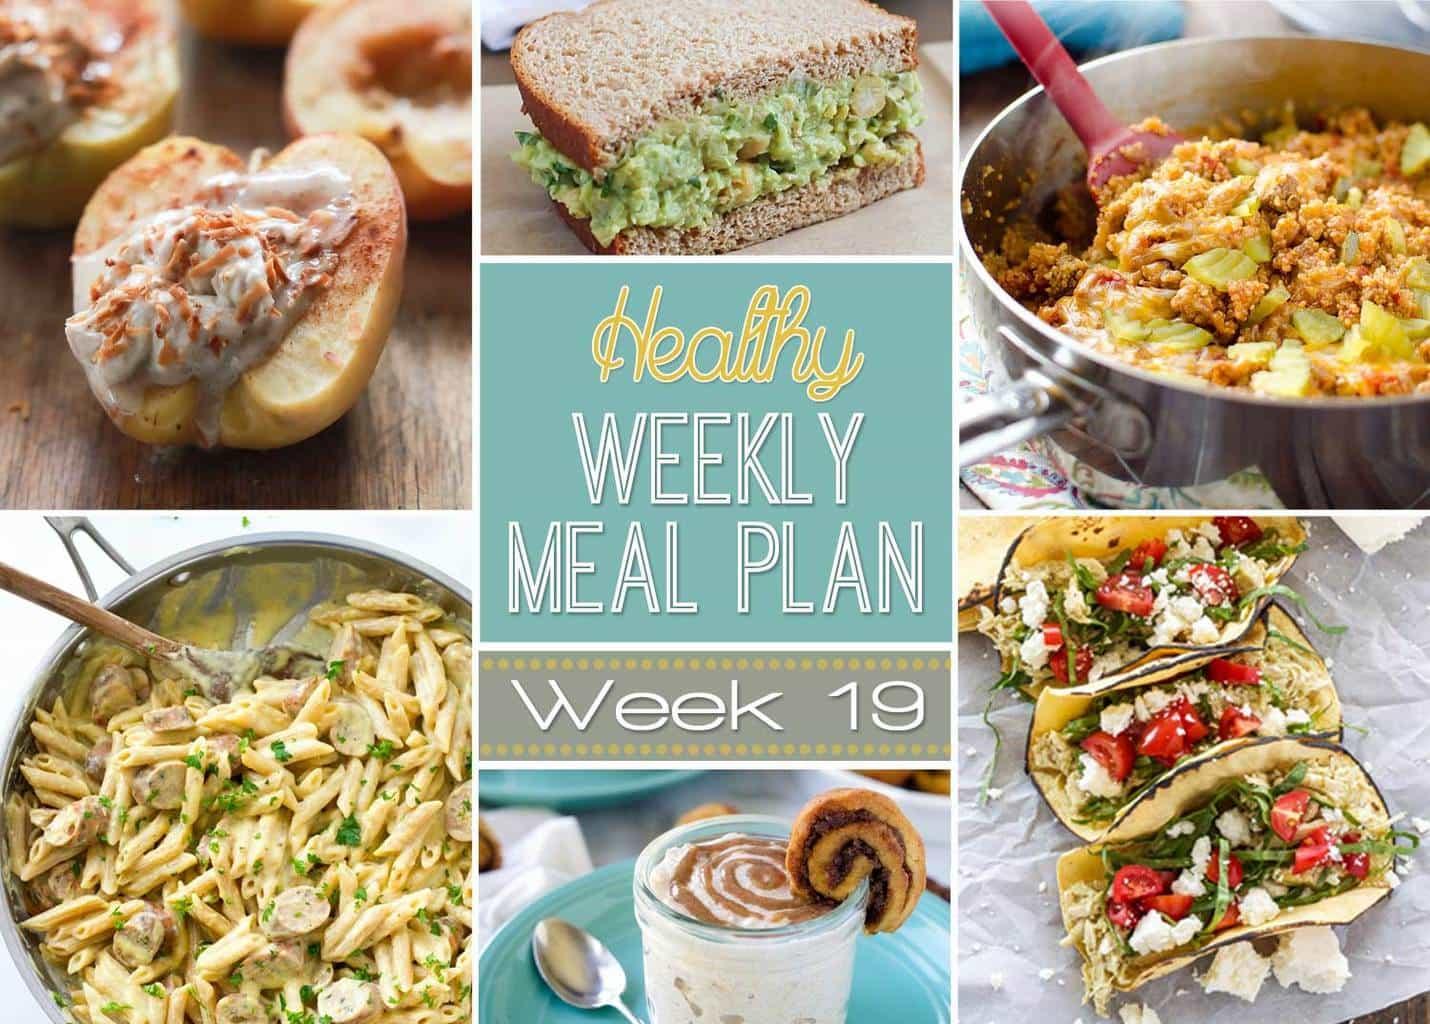 Healthy Weekly Meal Plan 19